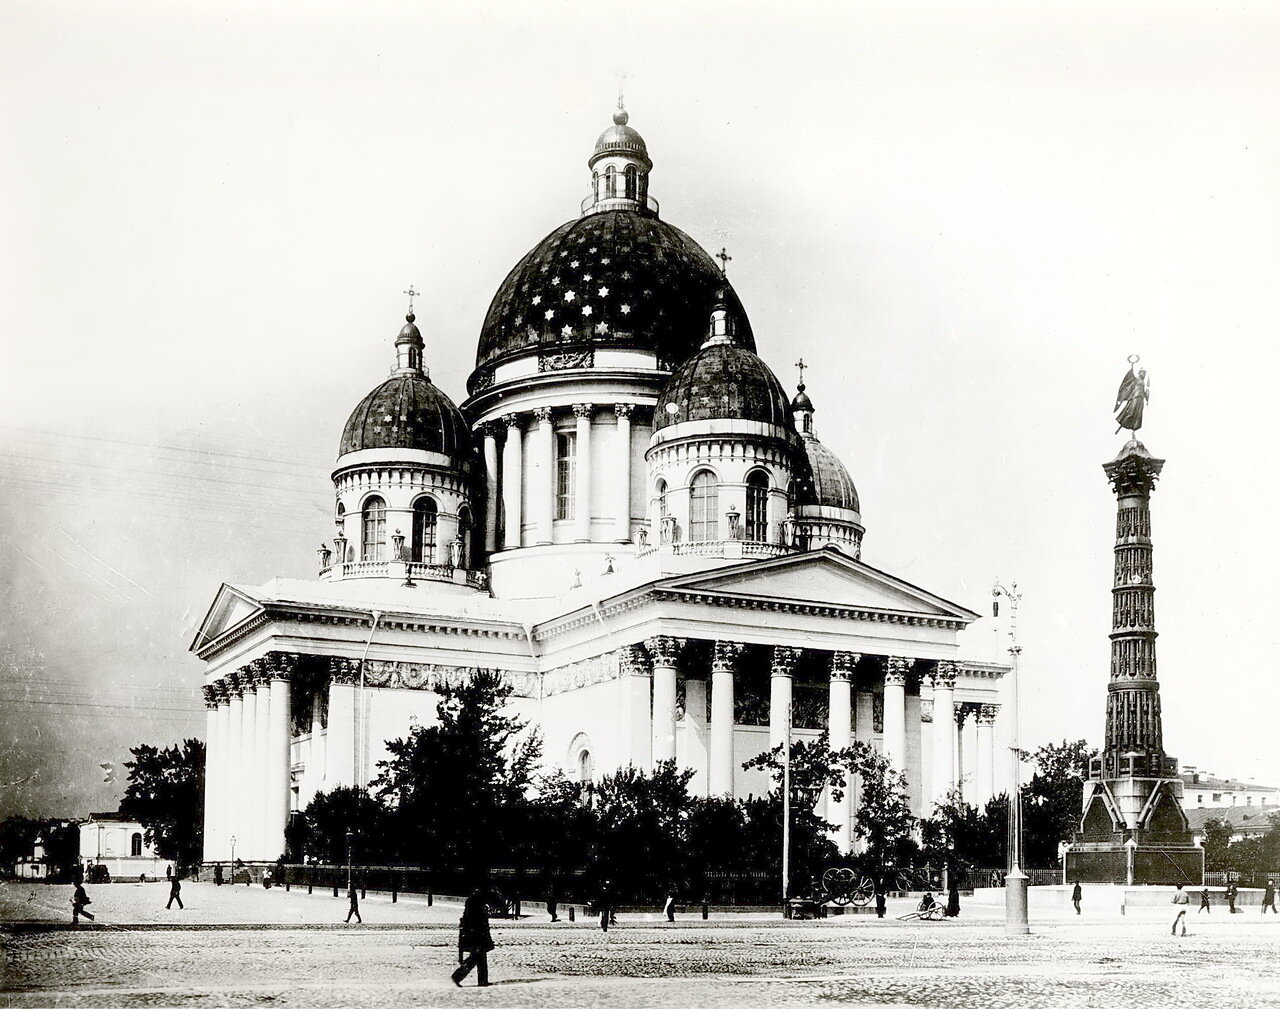 Свято--Троицкий Измайловский собор. Памятник Славе. 1886 г.